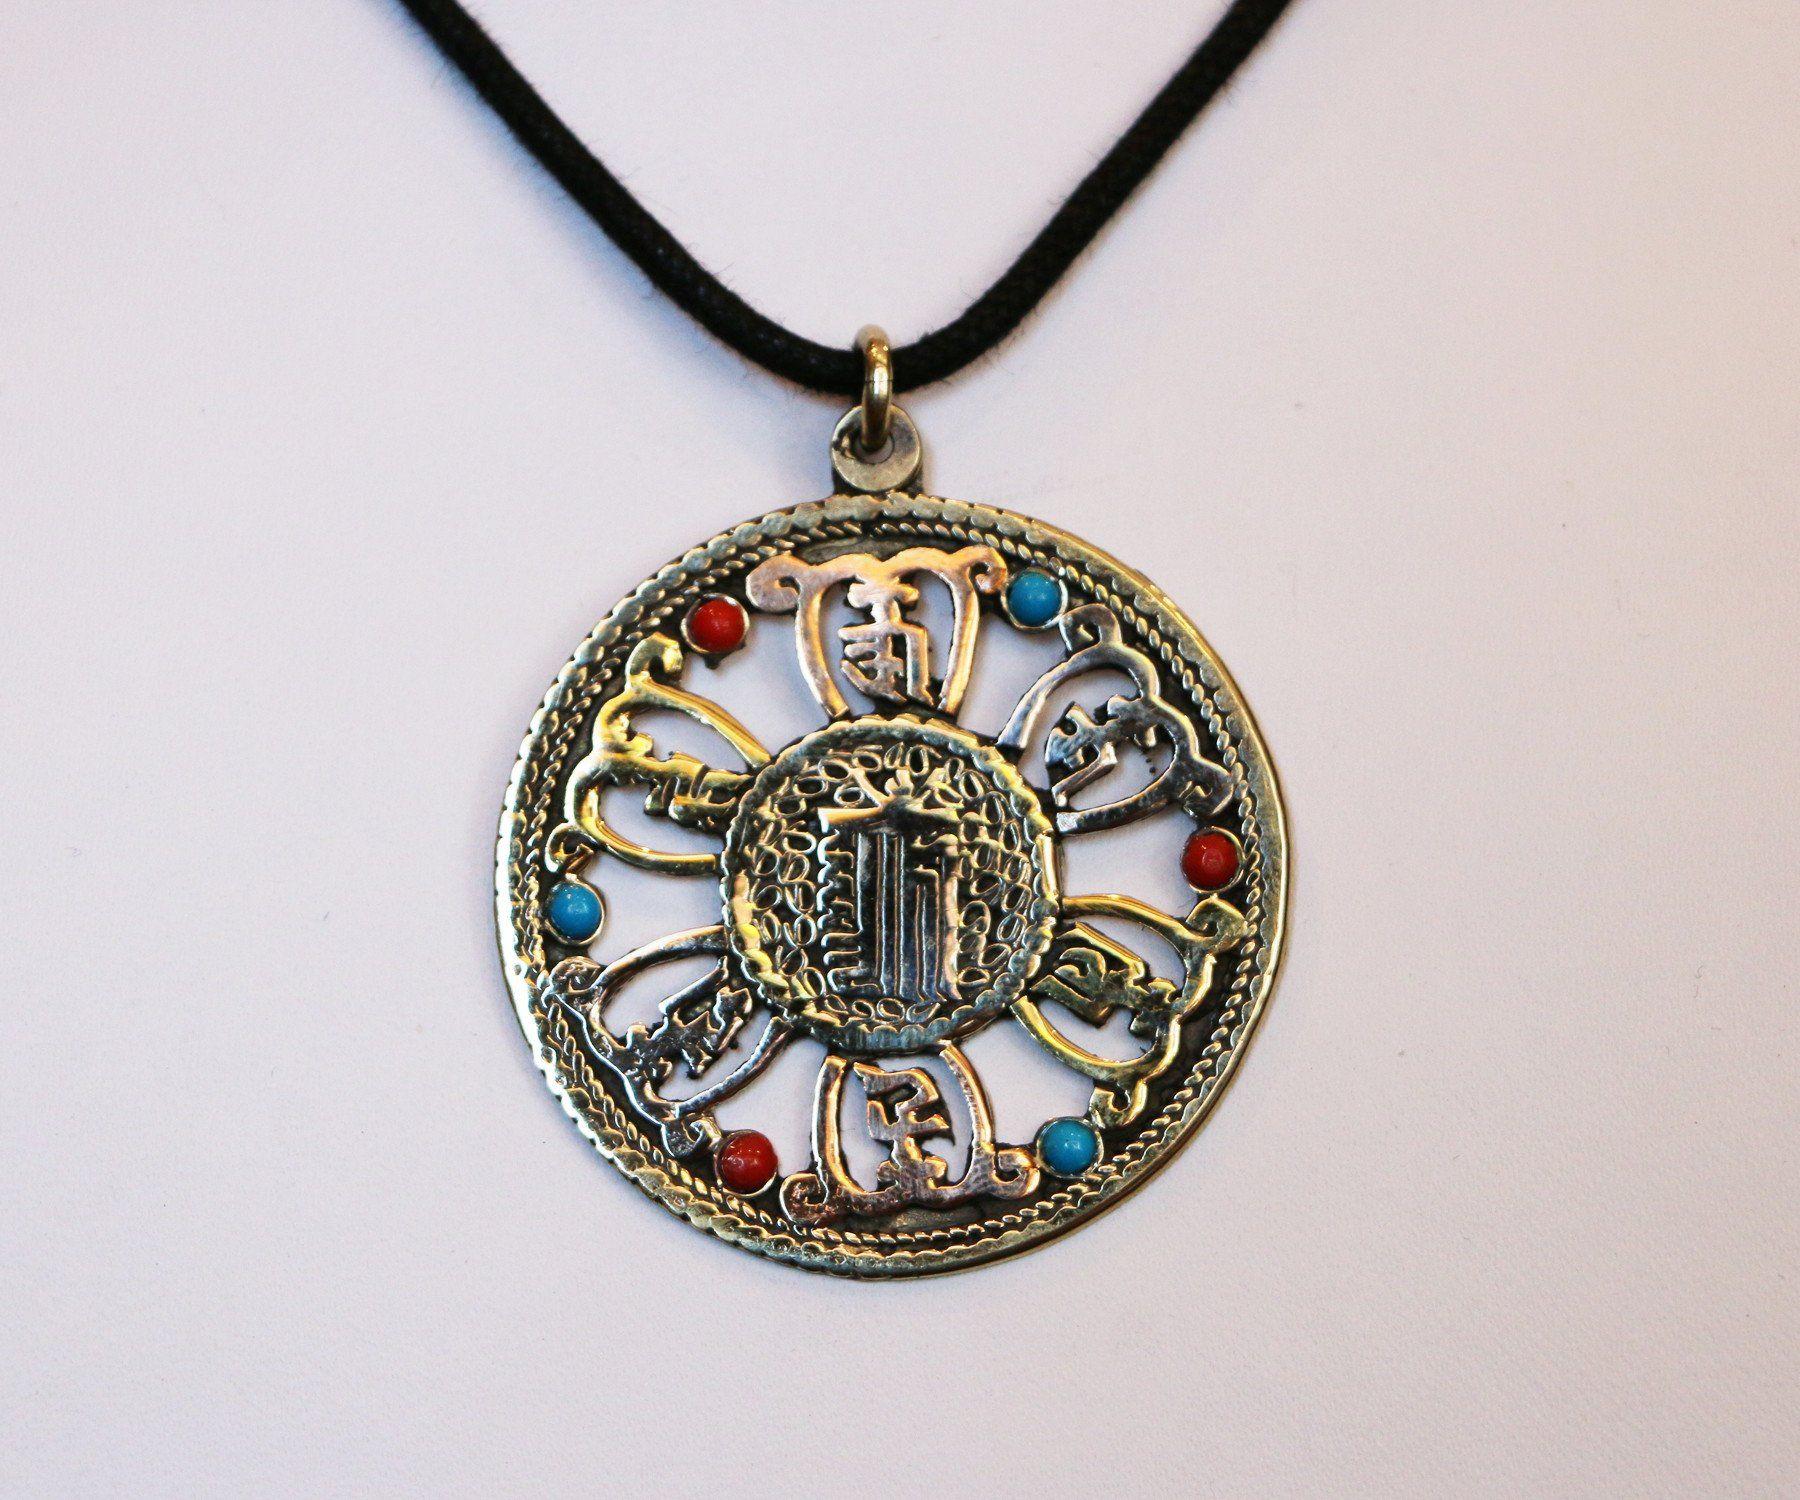 Kalachakra Symbol With Om Mani Padme Hung Products